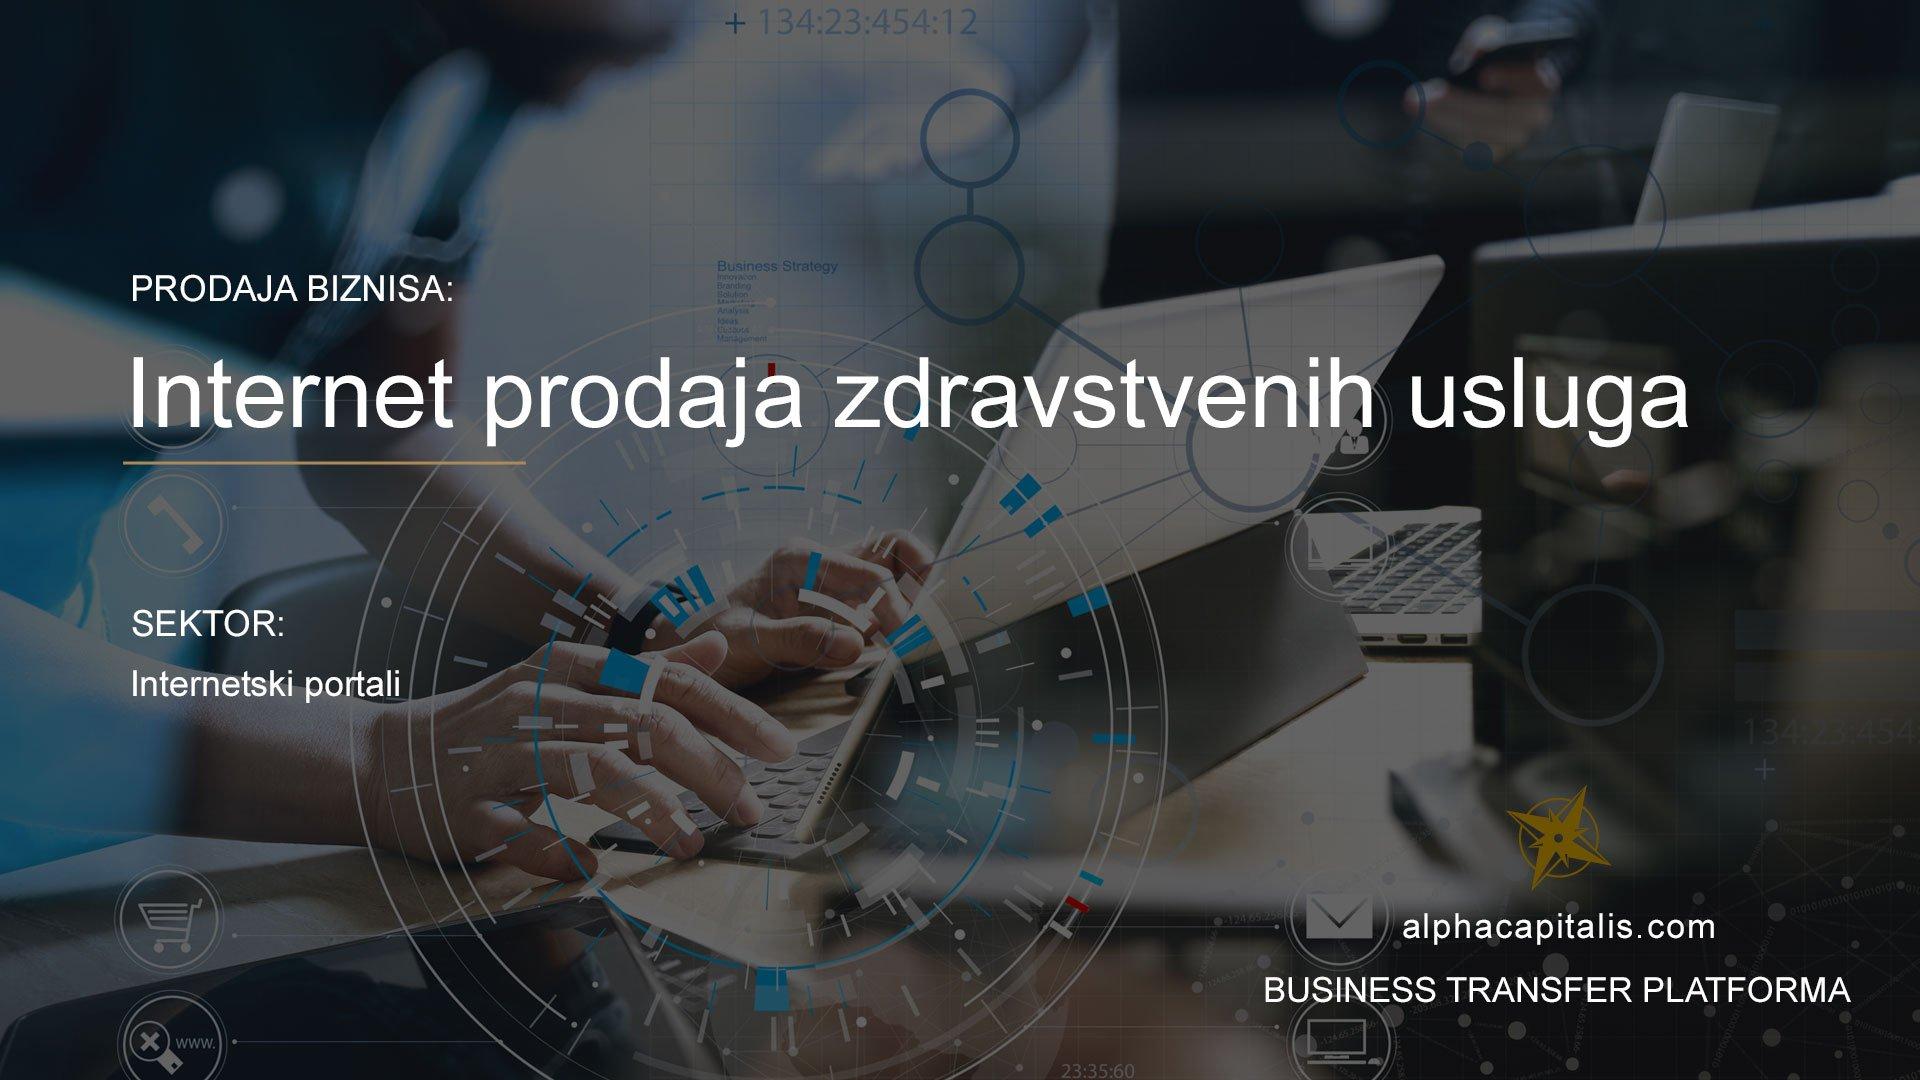 Alpha-Capitalis--Business-Transfer-Platforma_internet-prodaja